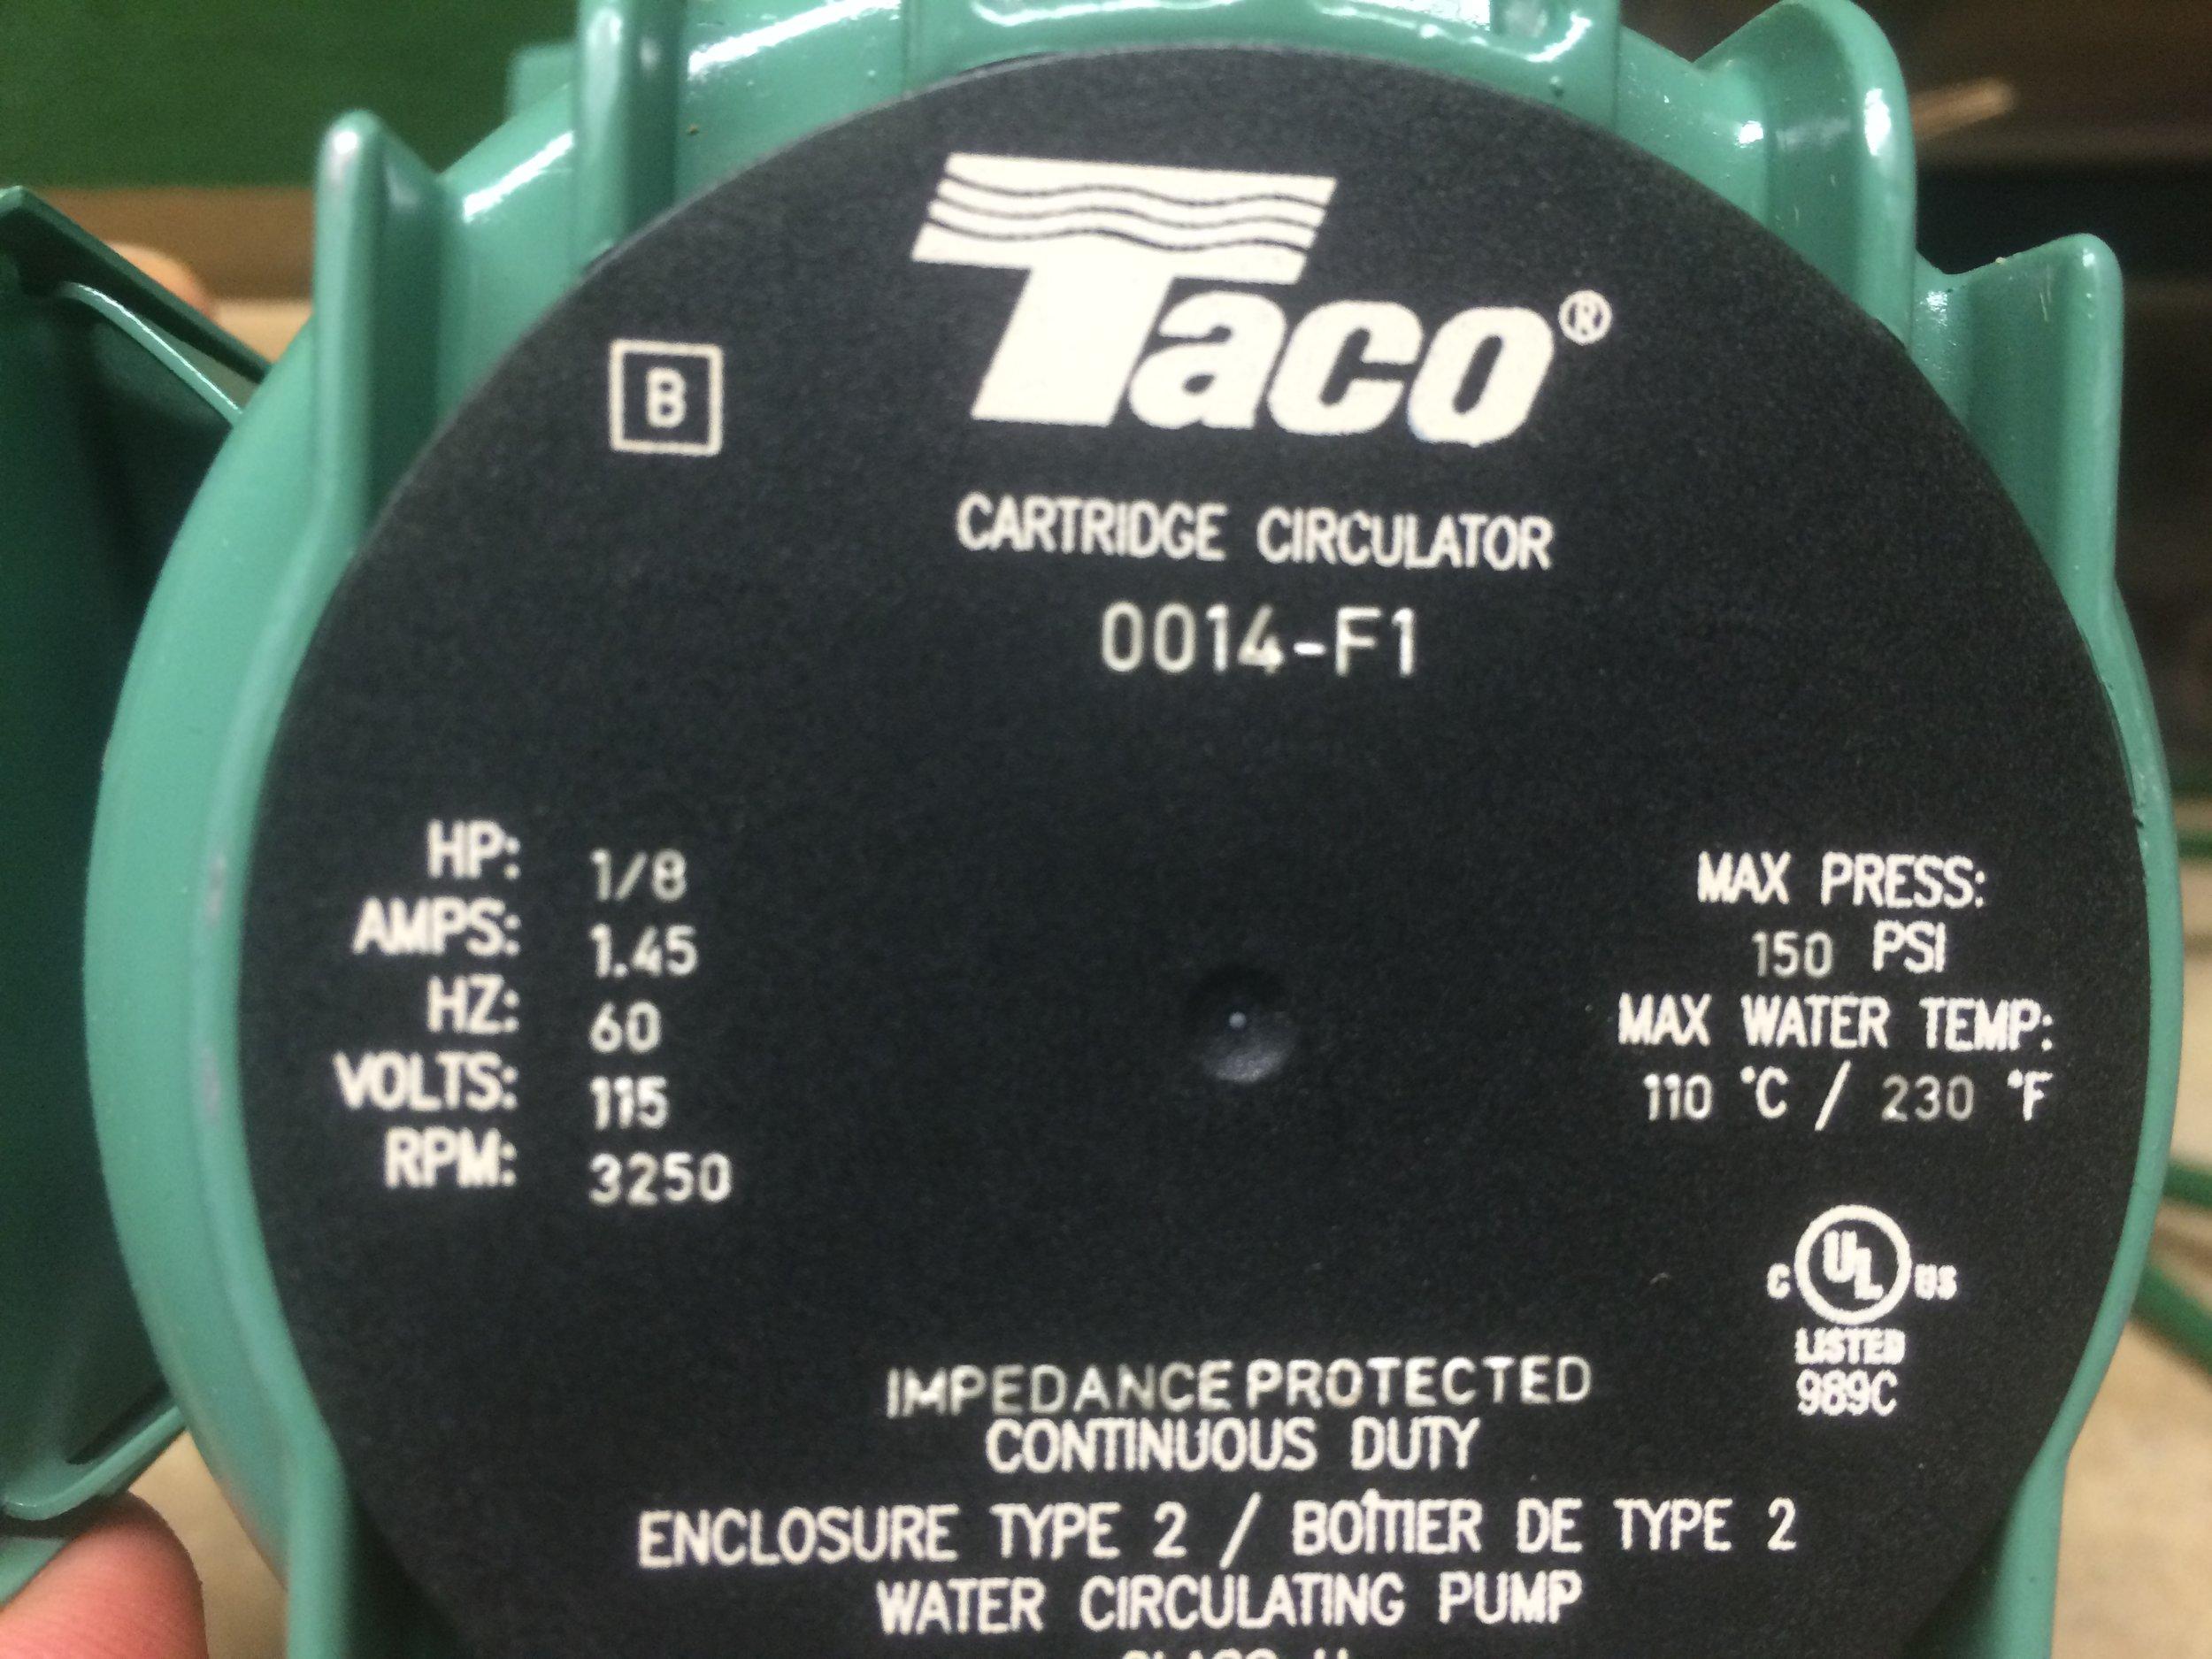 new taco pump in sacristy basement